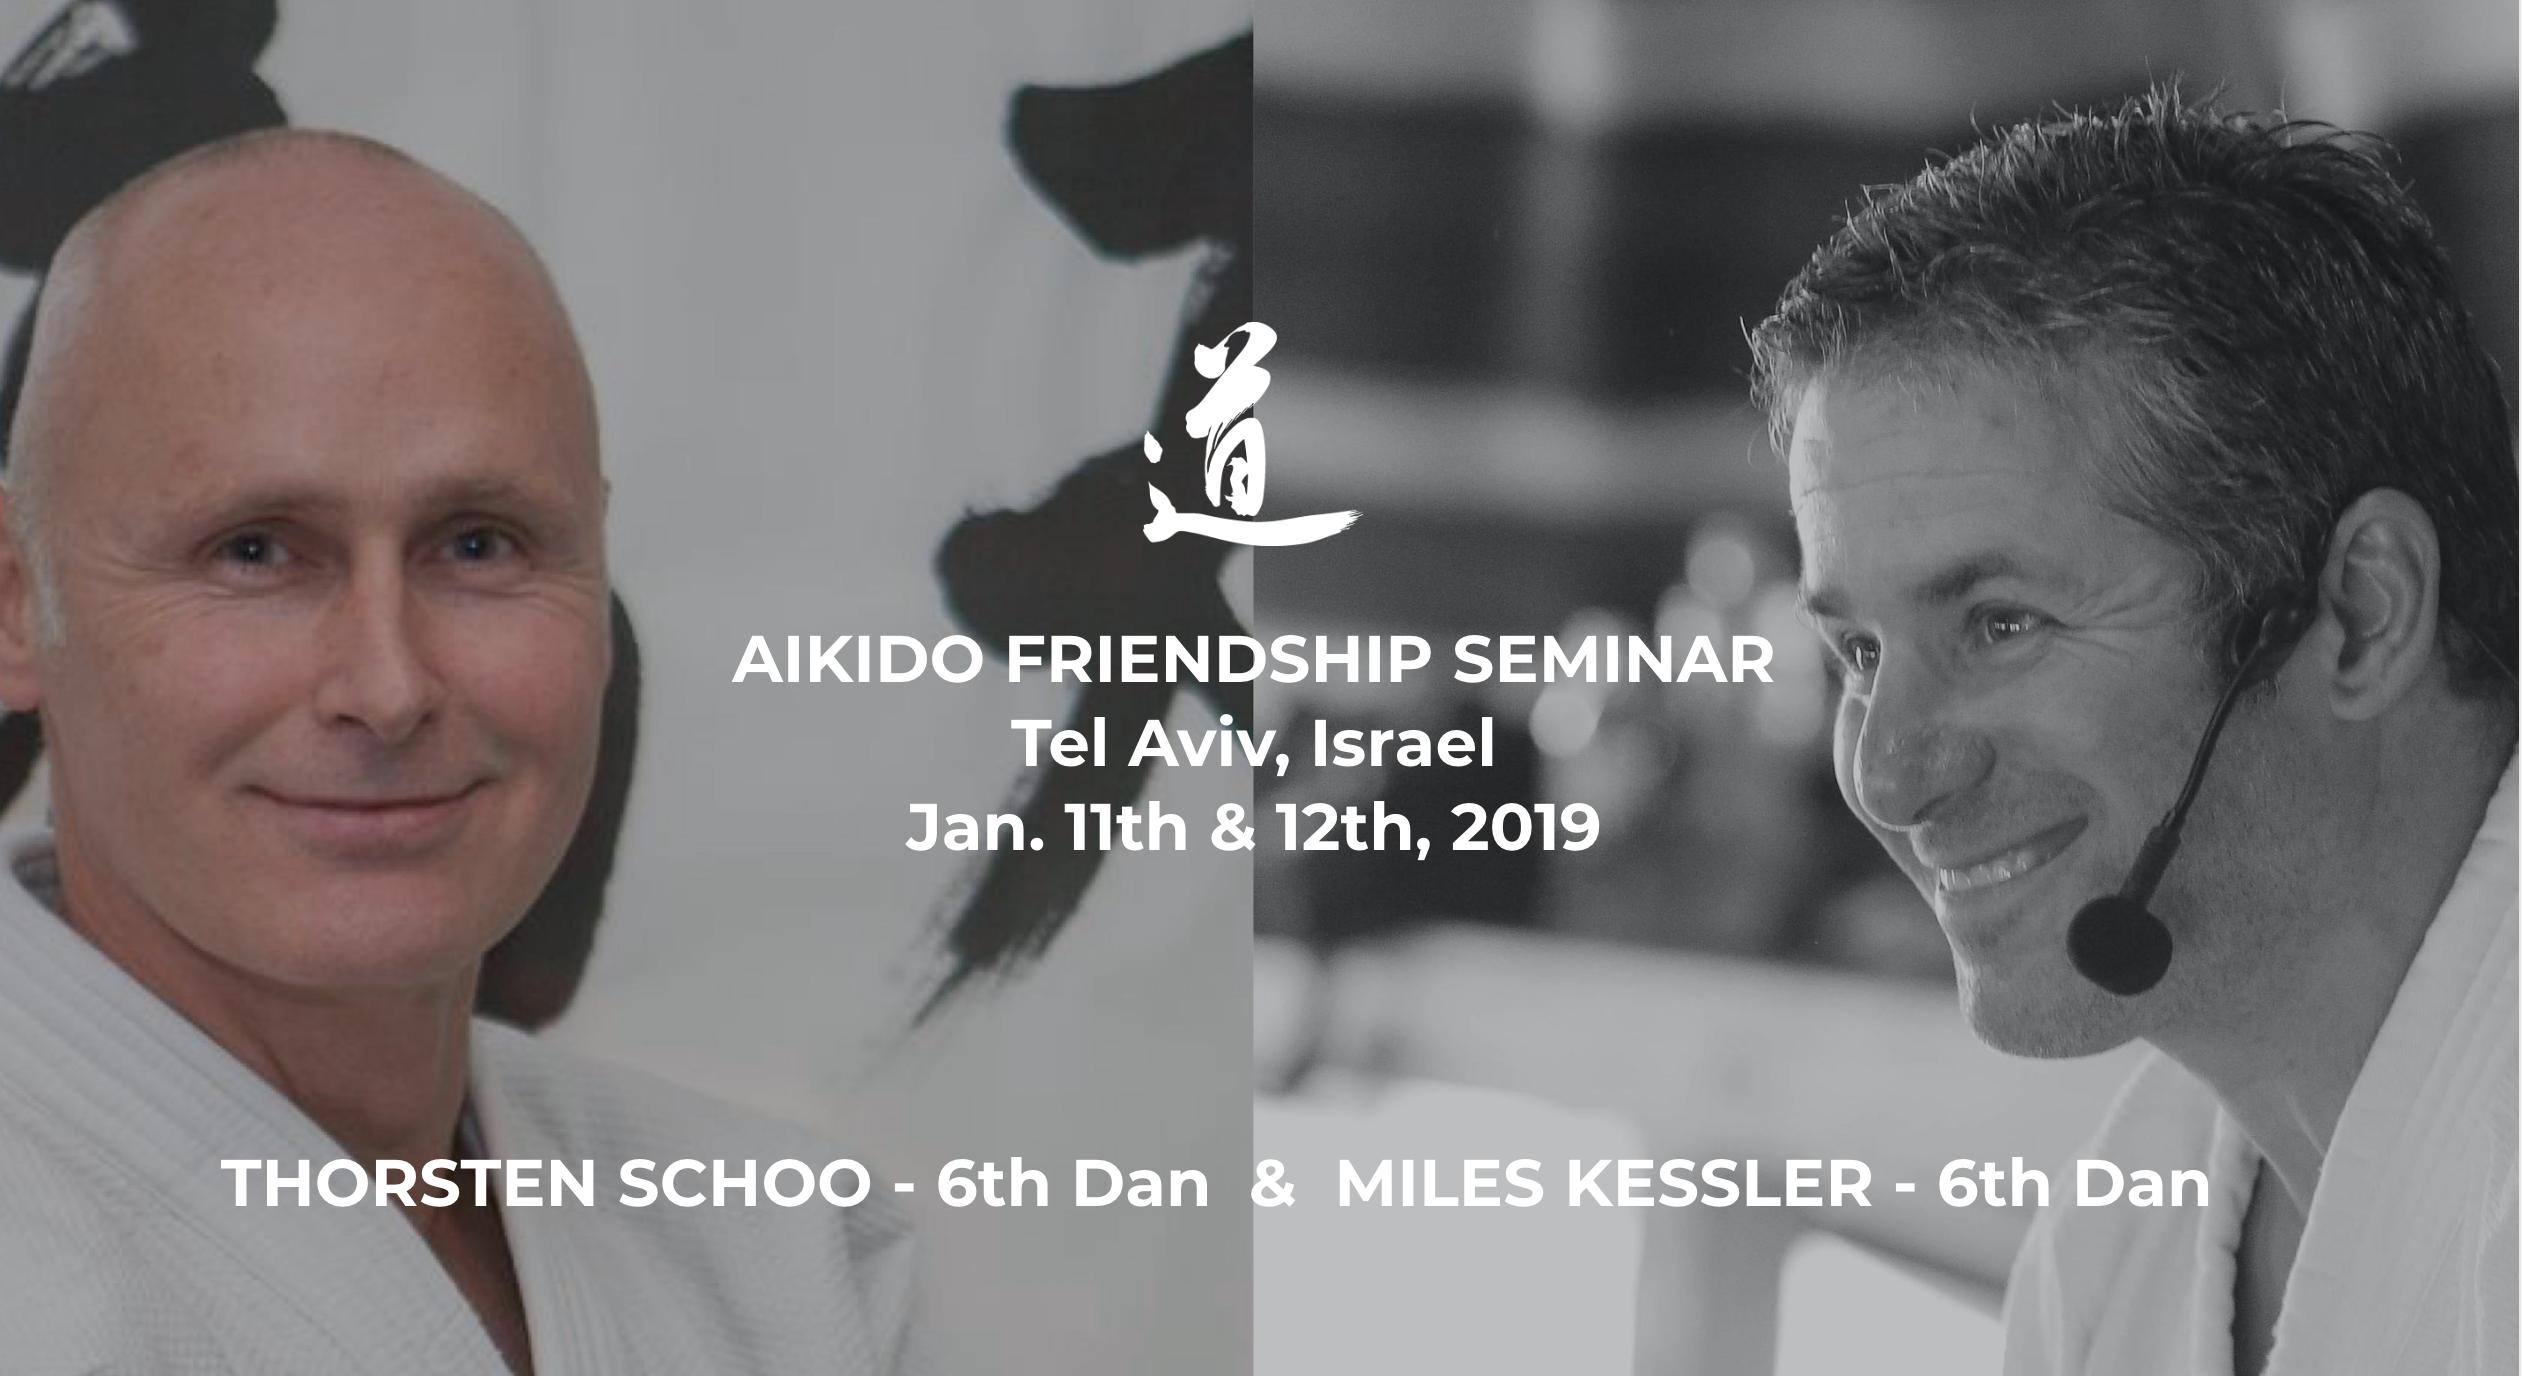 Friendship Seminar 2019 -Thorsten Schoo & Miles Kessler